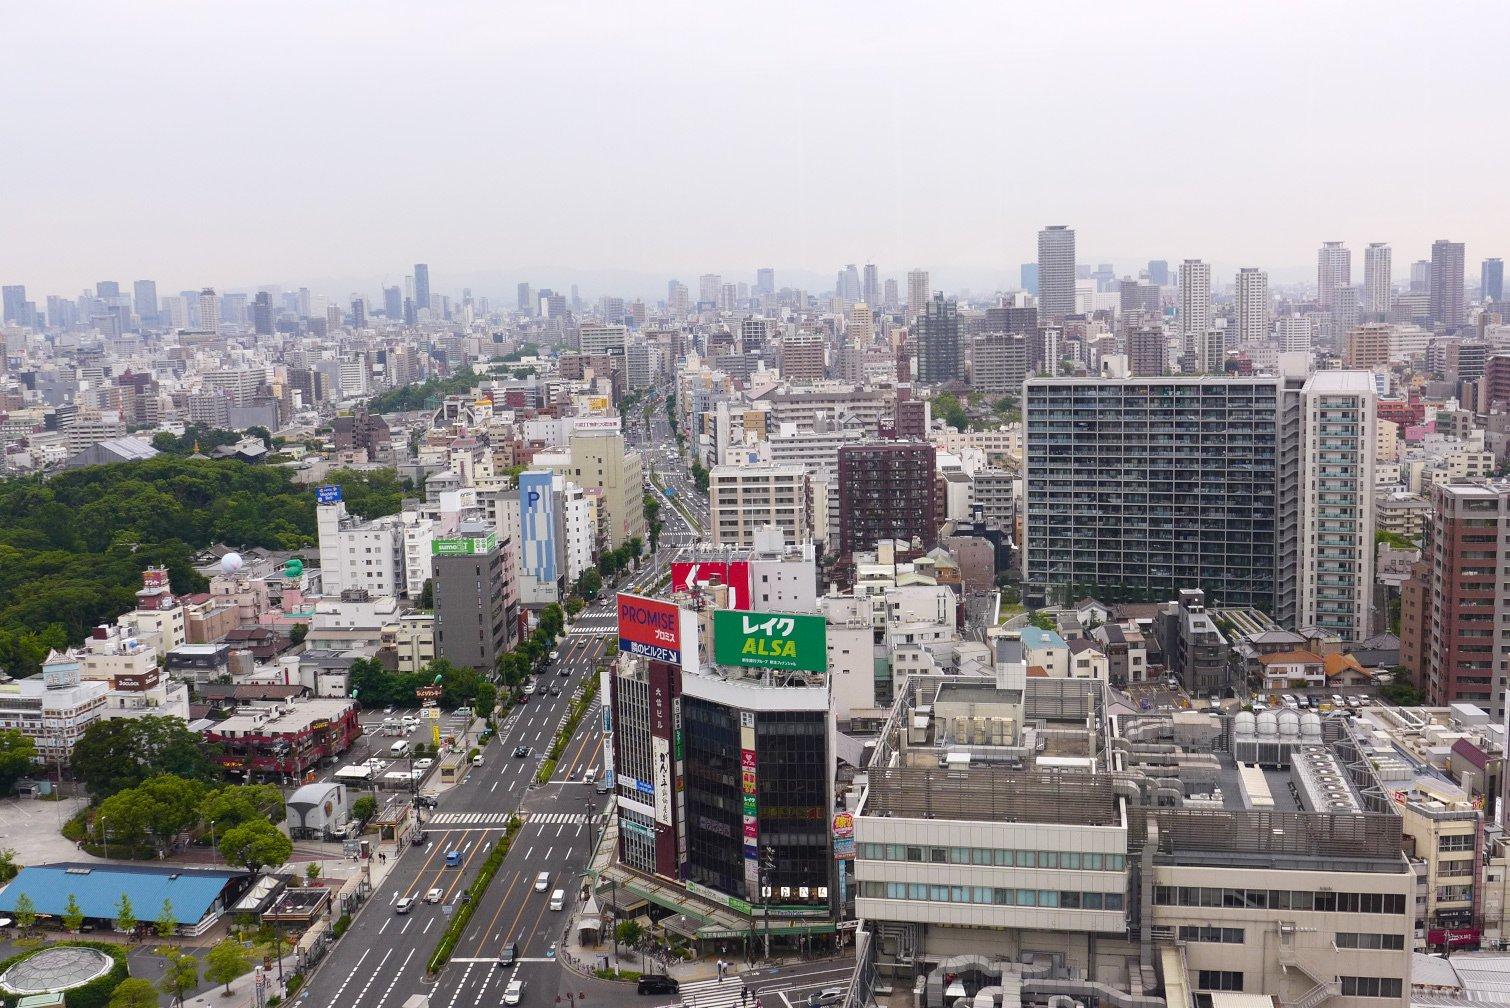 Osaka Japan travel; What to do in Osaka Japan; What to see in Osaka Japan; D.I.Y. Japan itinerary